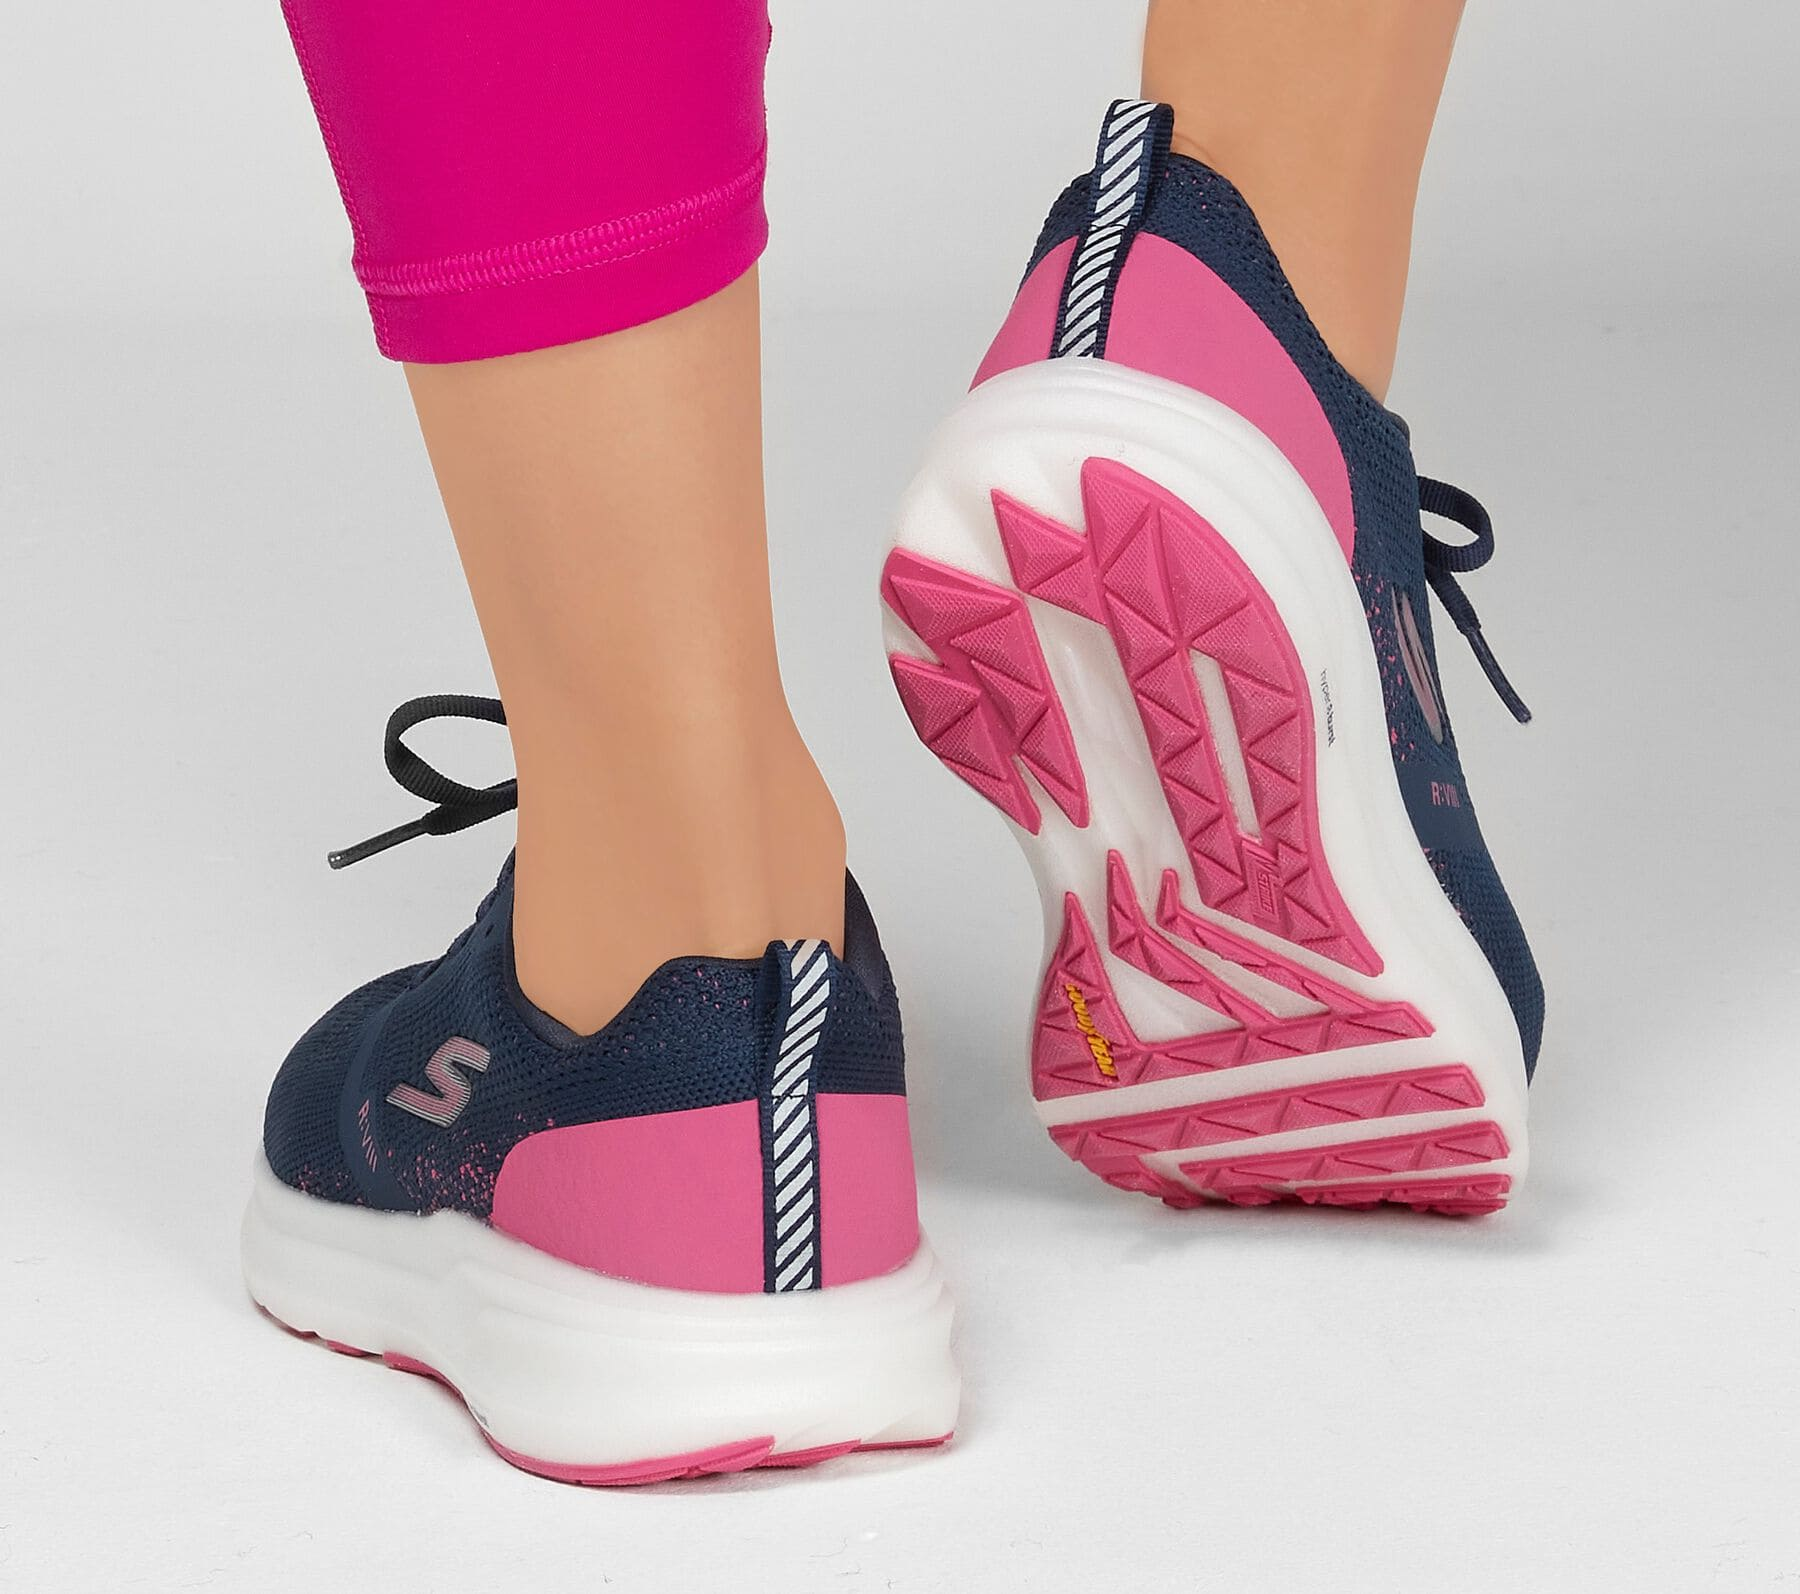 Tênis Go Run Ride 8 Feminino Skechers Navy e Pink